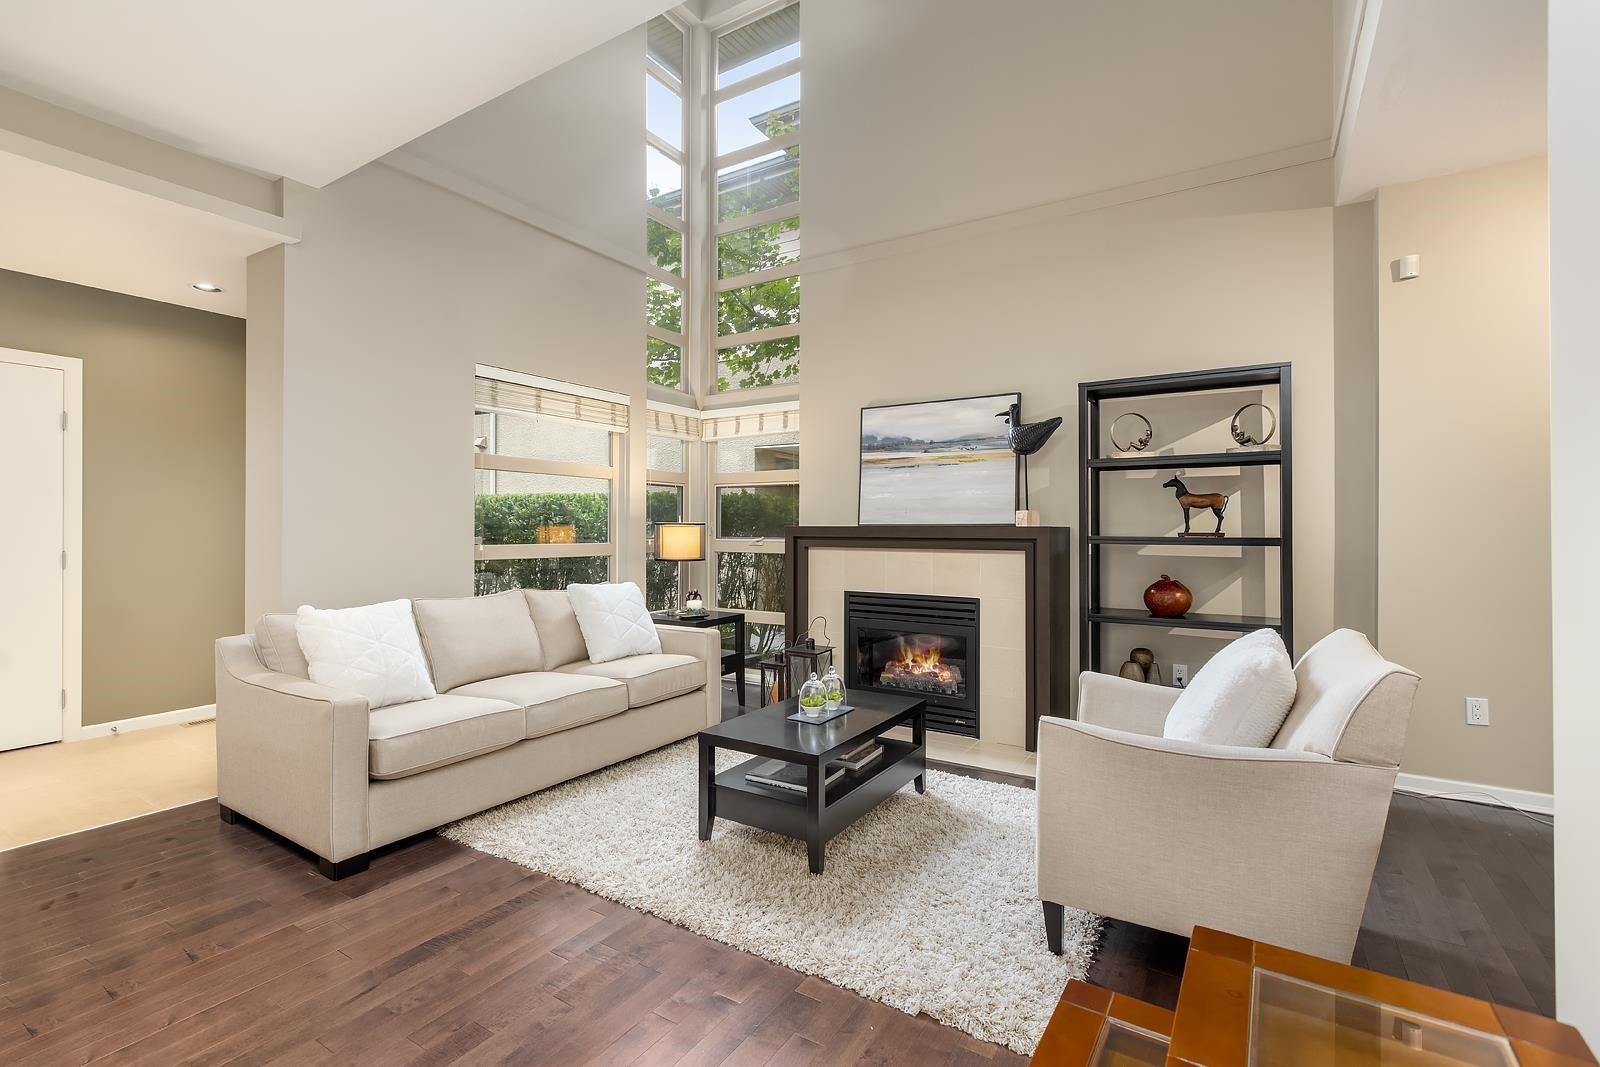 6 3750 EDGEMONT BOULEVARD - Edgemont Townhouse for sale, 4 Bedrooms (R2617117) - #1